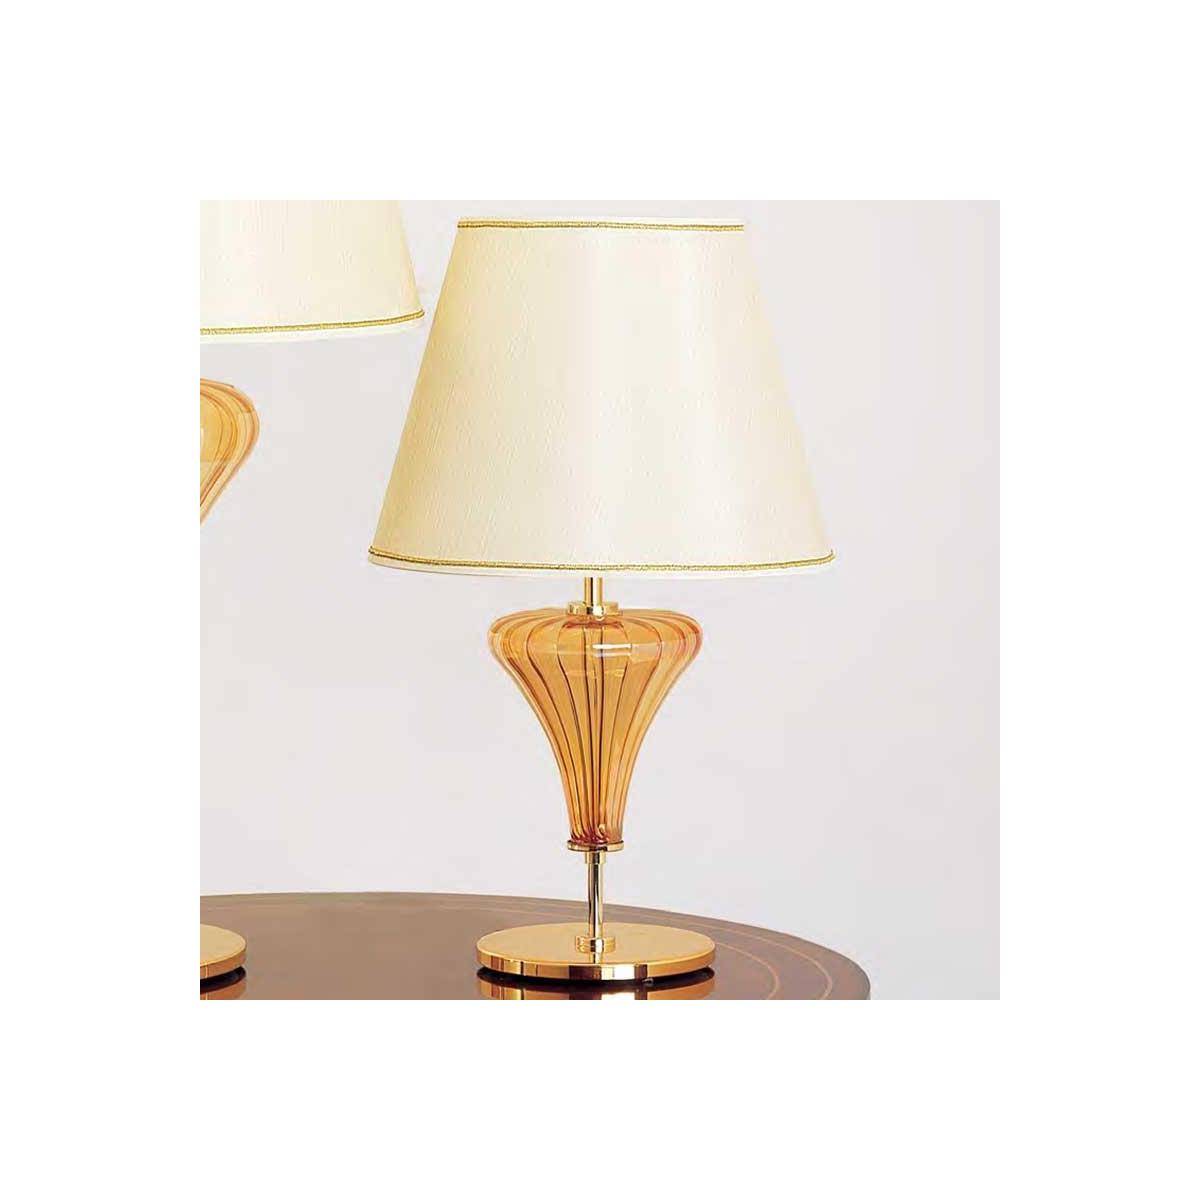 """Meridiana"" lampe de chevet en verre de Murano - 1 lumière - ambre"